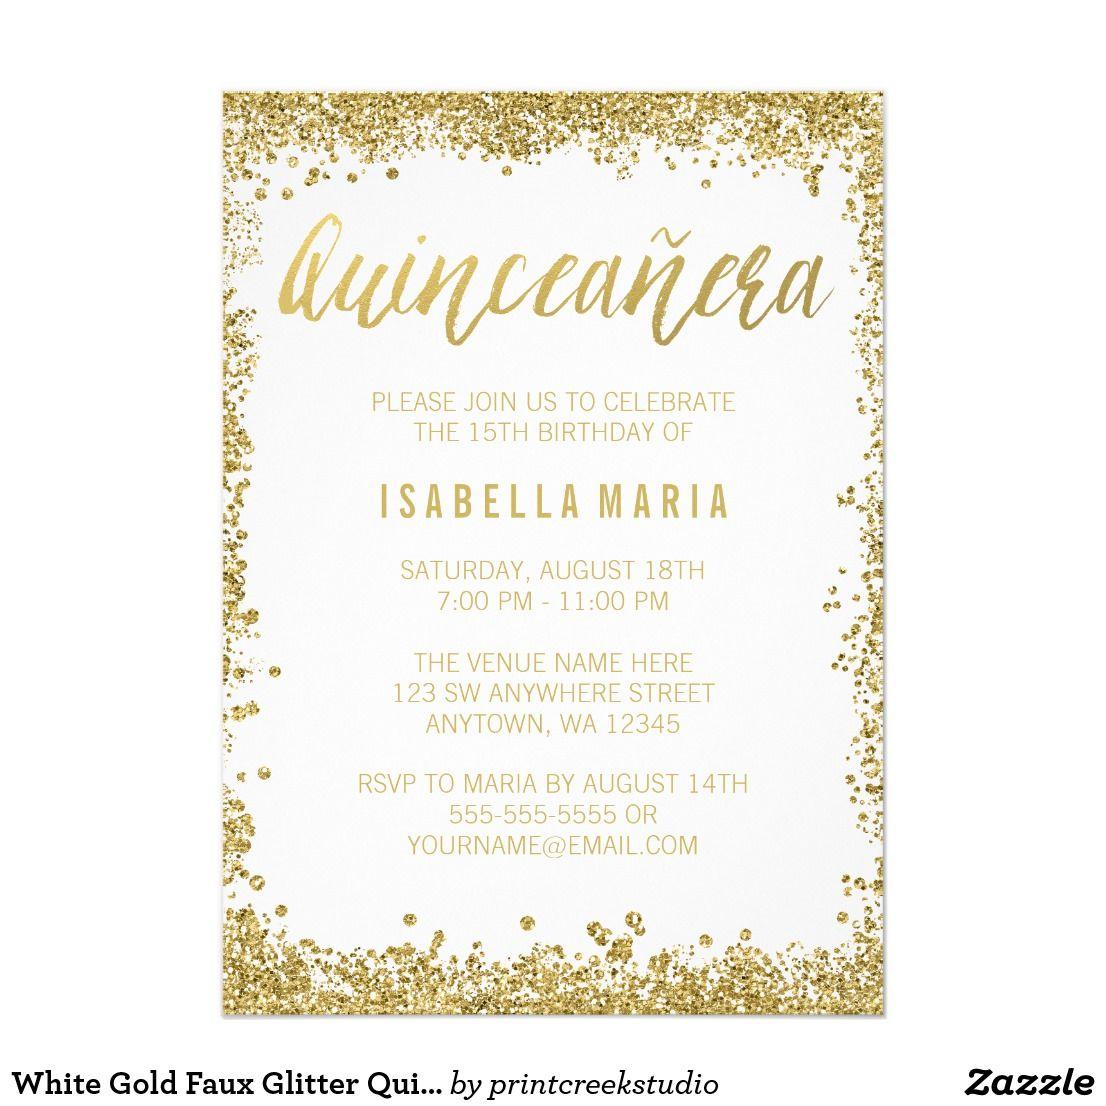 White Gold Faux Glitter Quinceanera 15th Birthday Card Modern white ...